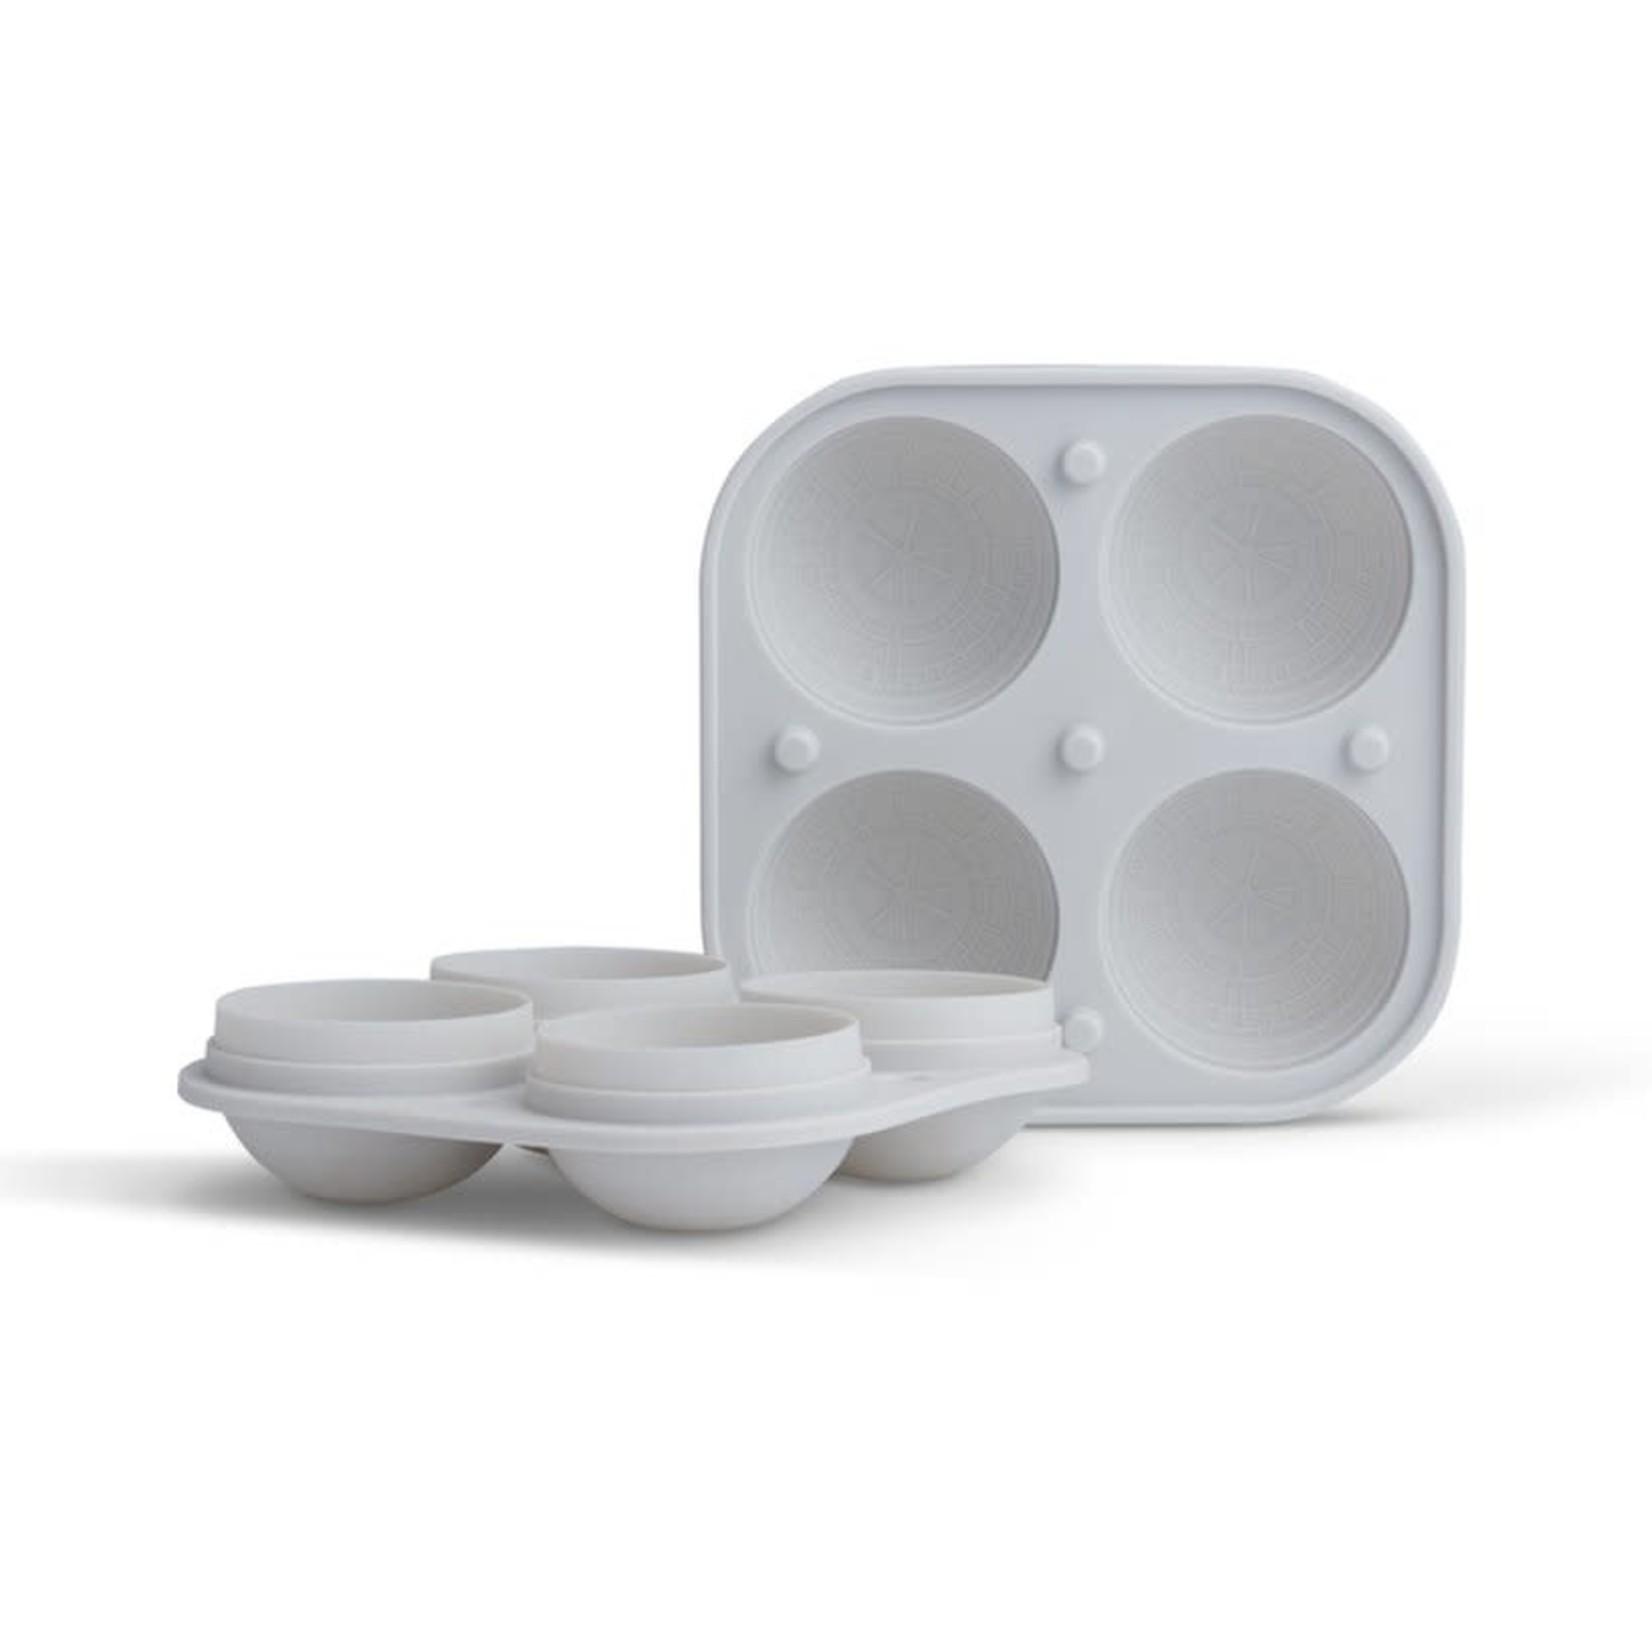 W&P Design W&P Sphere Death Star™ Ice Tray